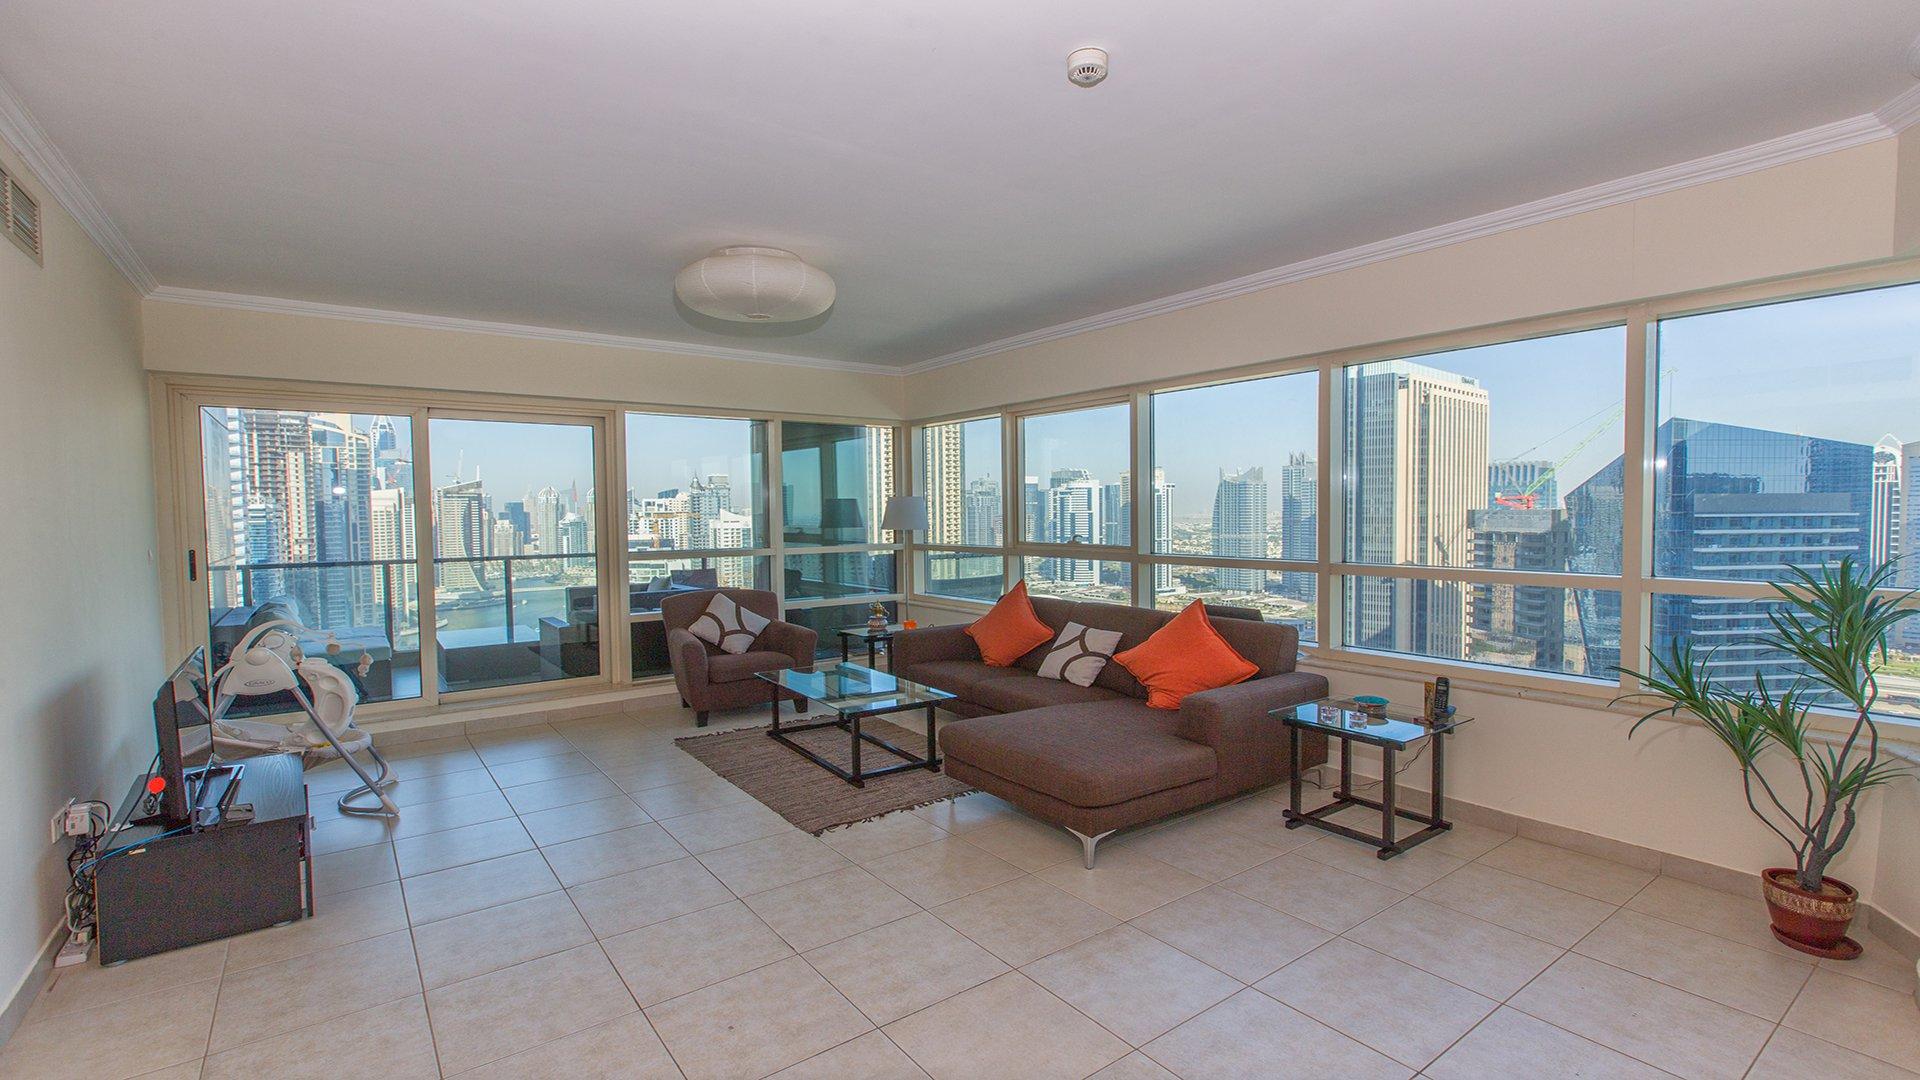 Ad Rental Apartment Dubai Marina Marina Quays West ref:L0316DU